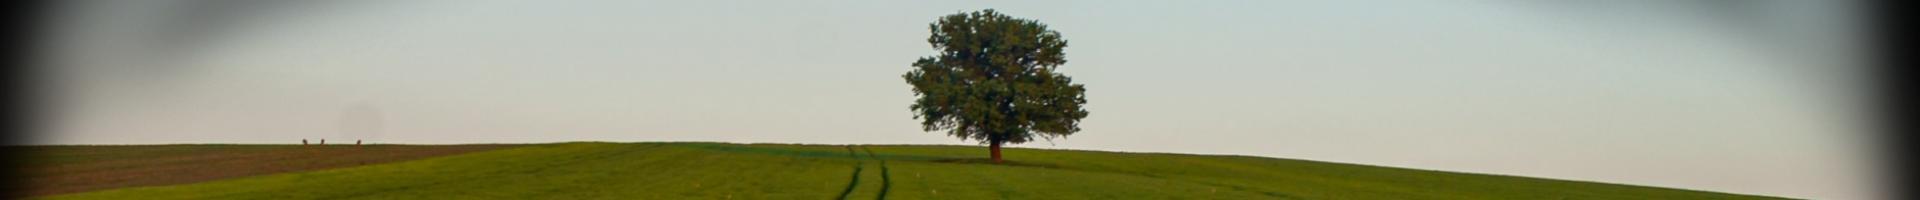 Catholic Climate Covenant - verdant view of tree